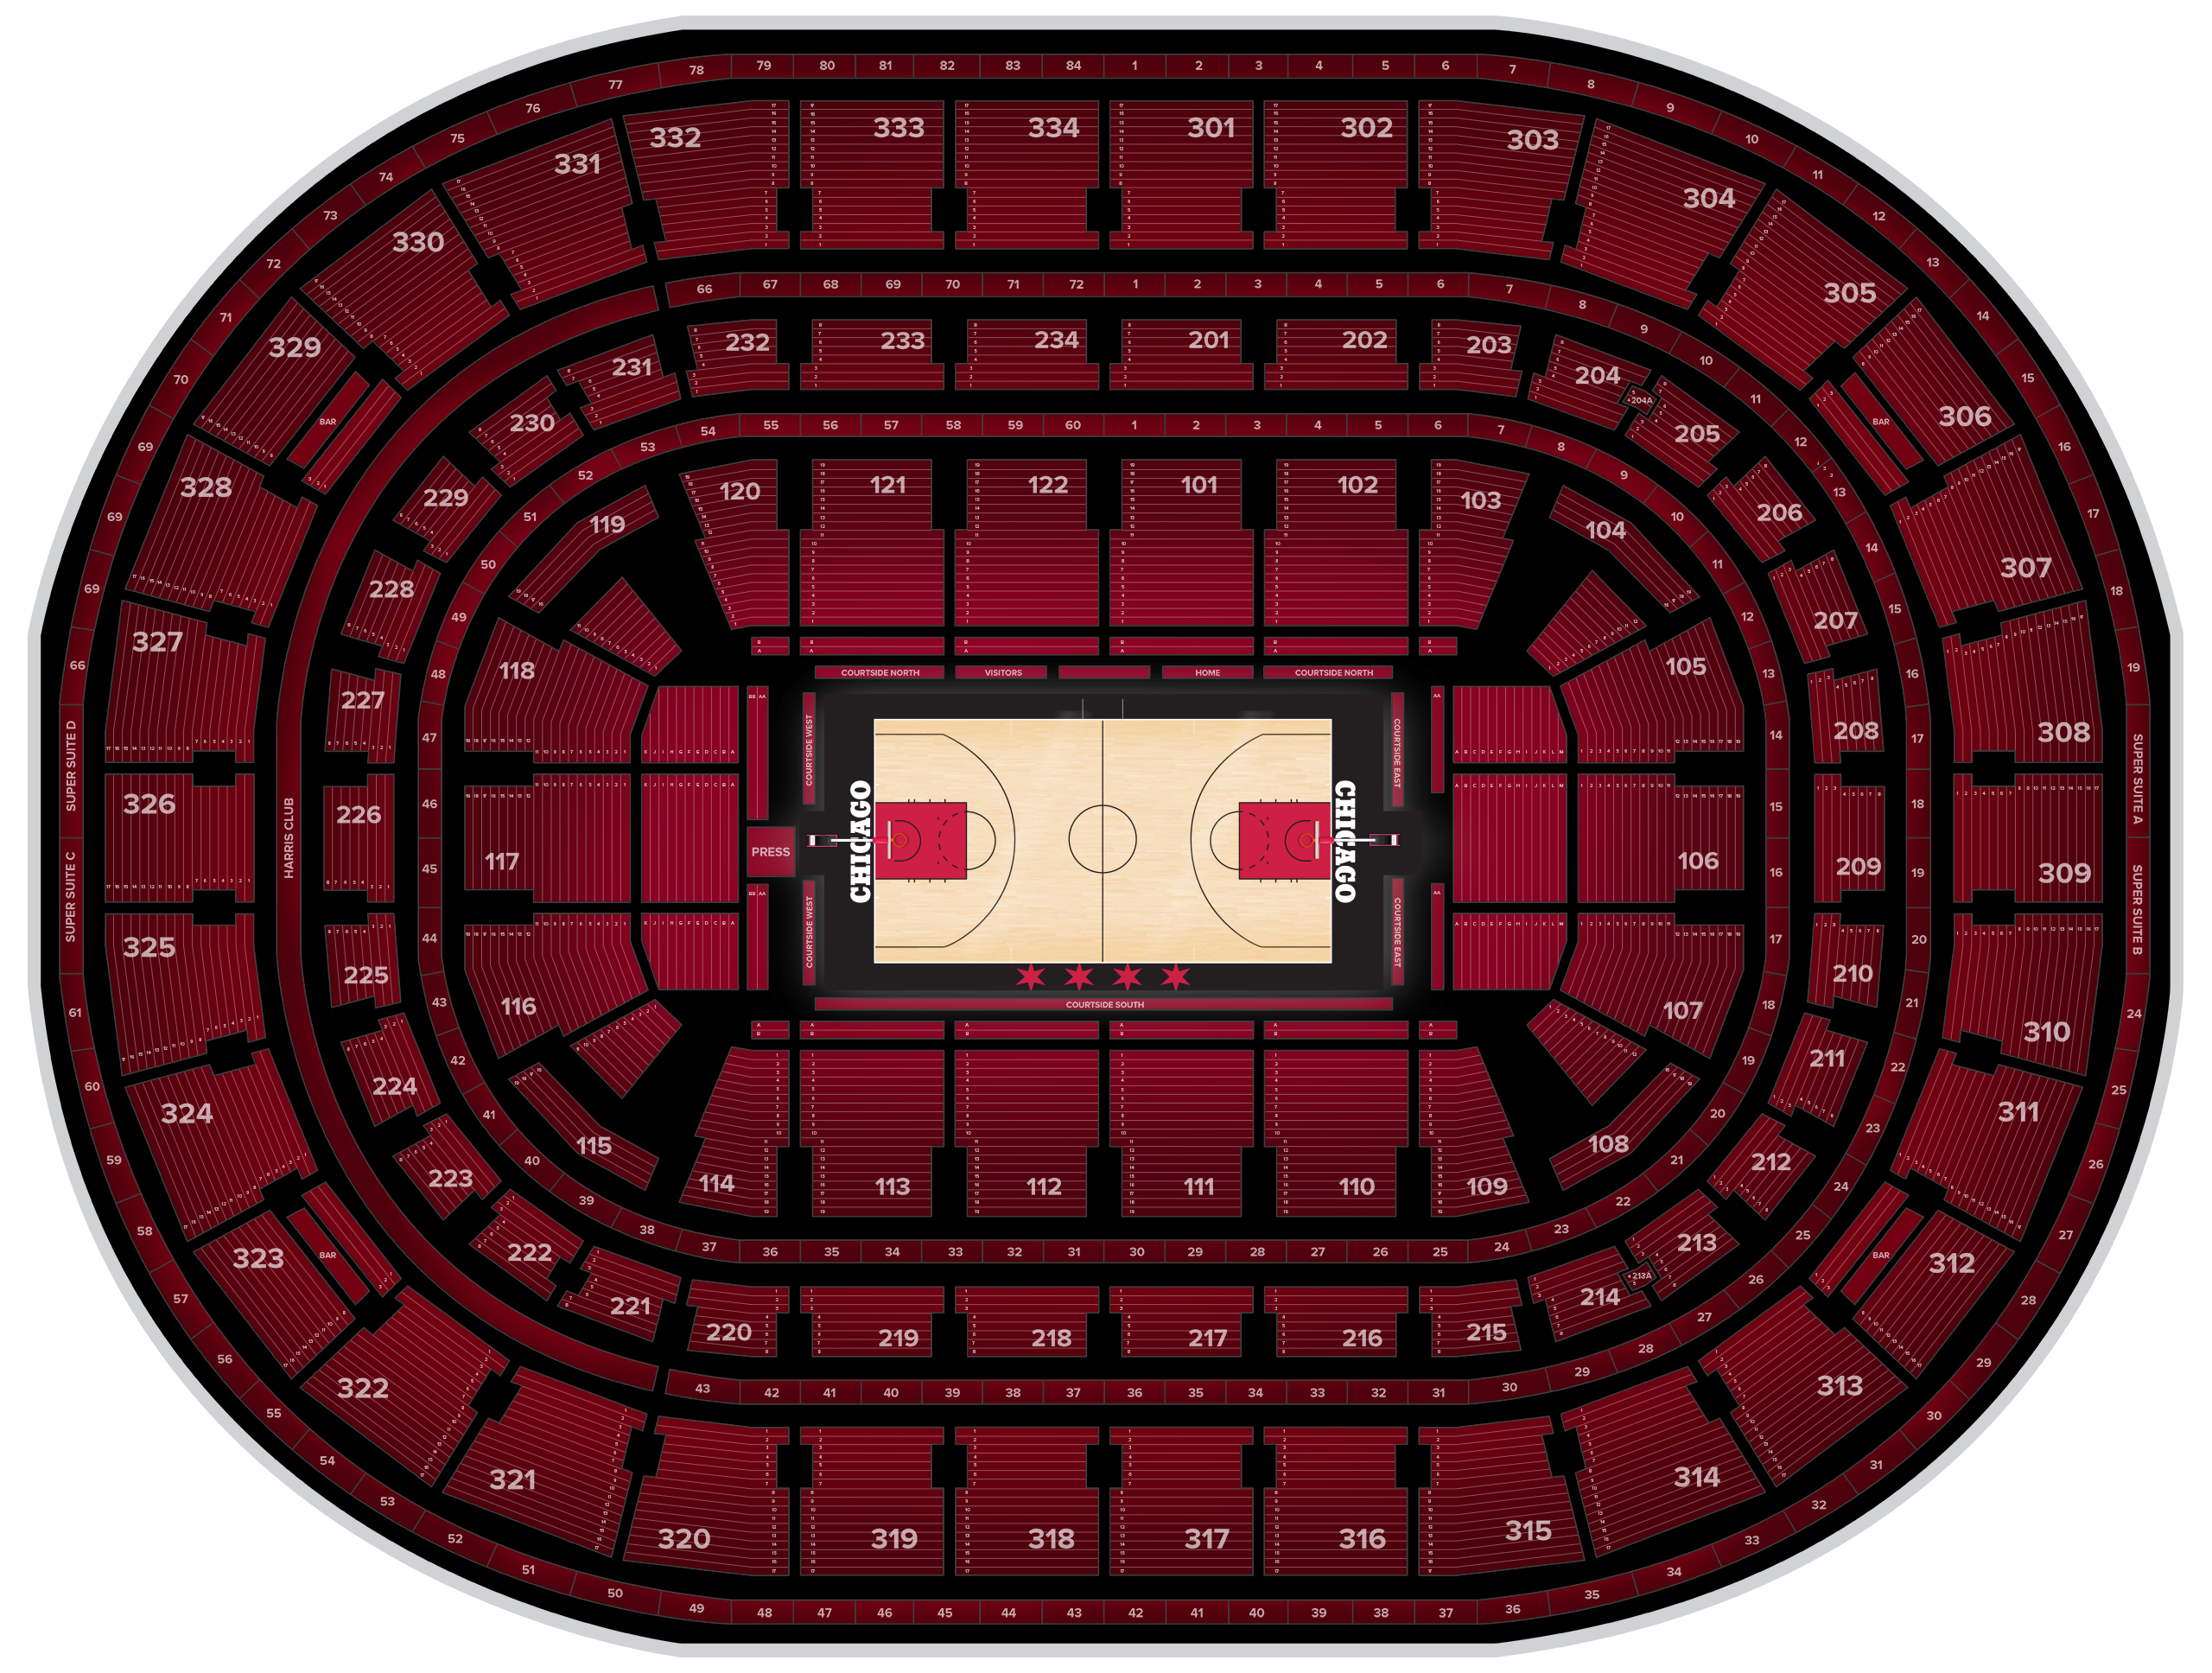 United Center Tickets